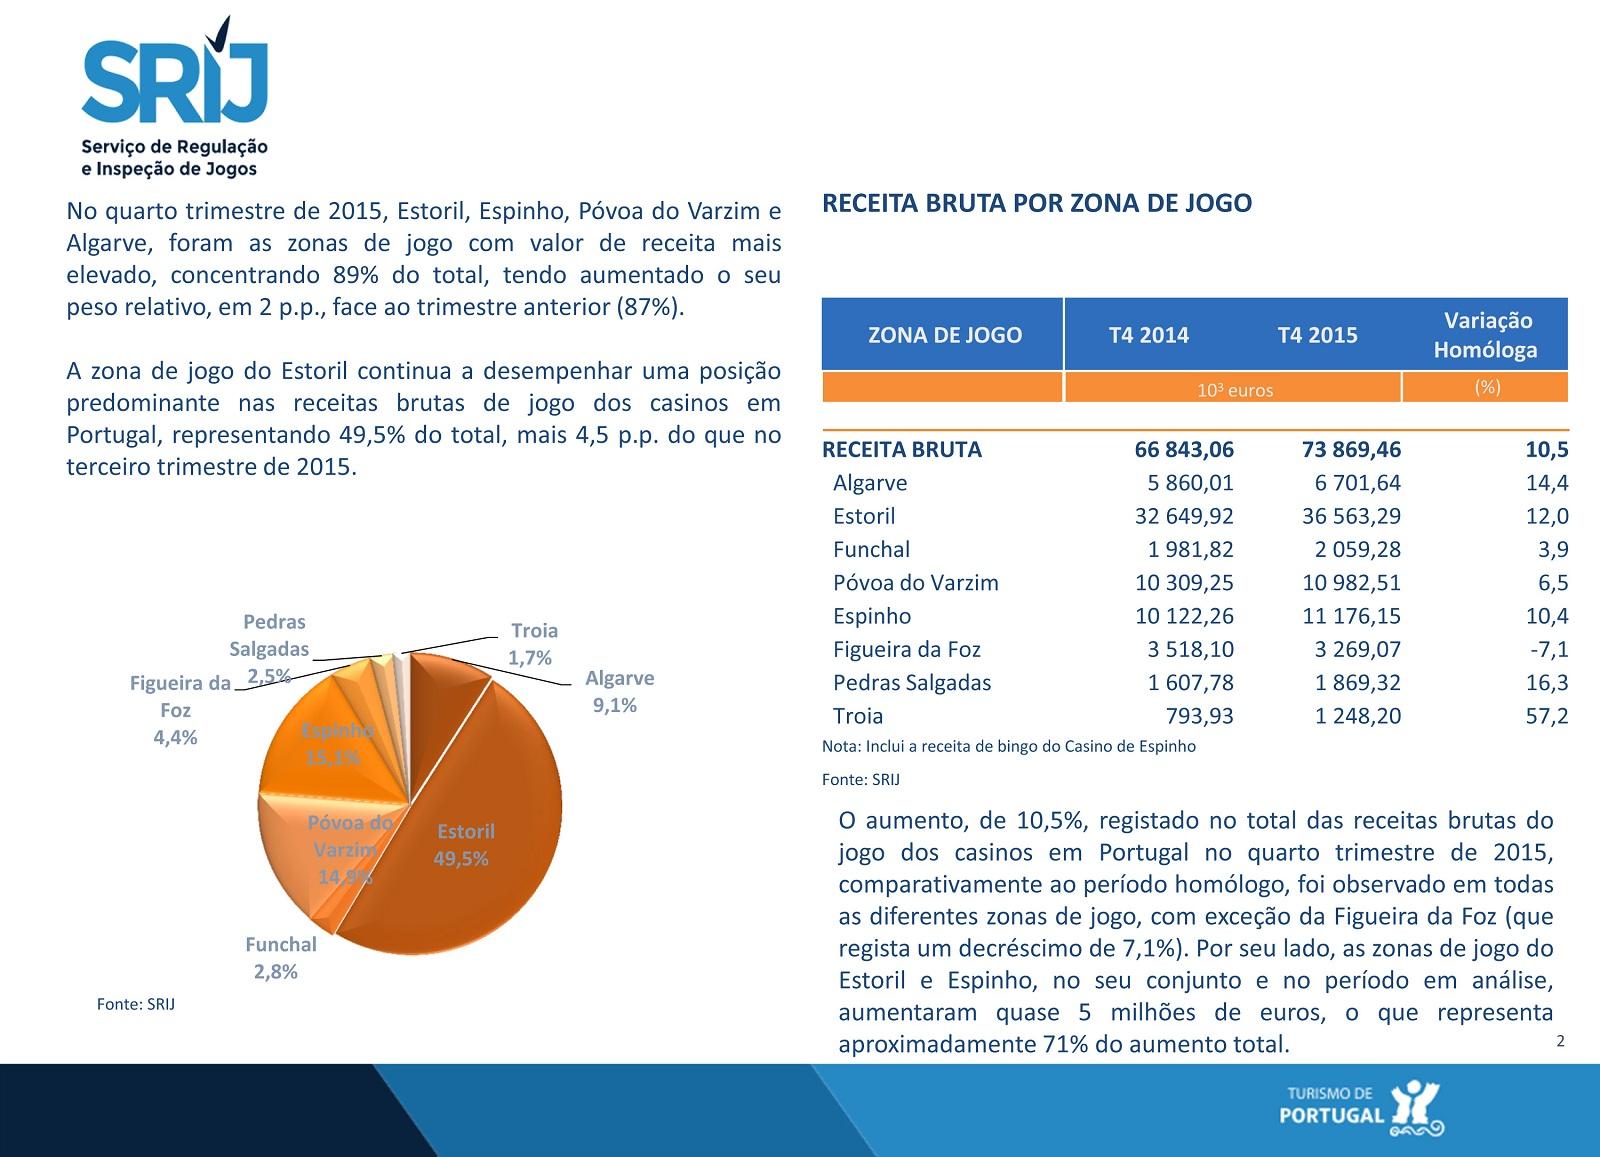 estatisticas-4t-de-2015-2